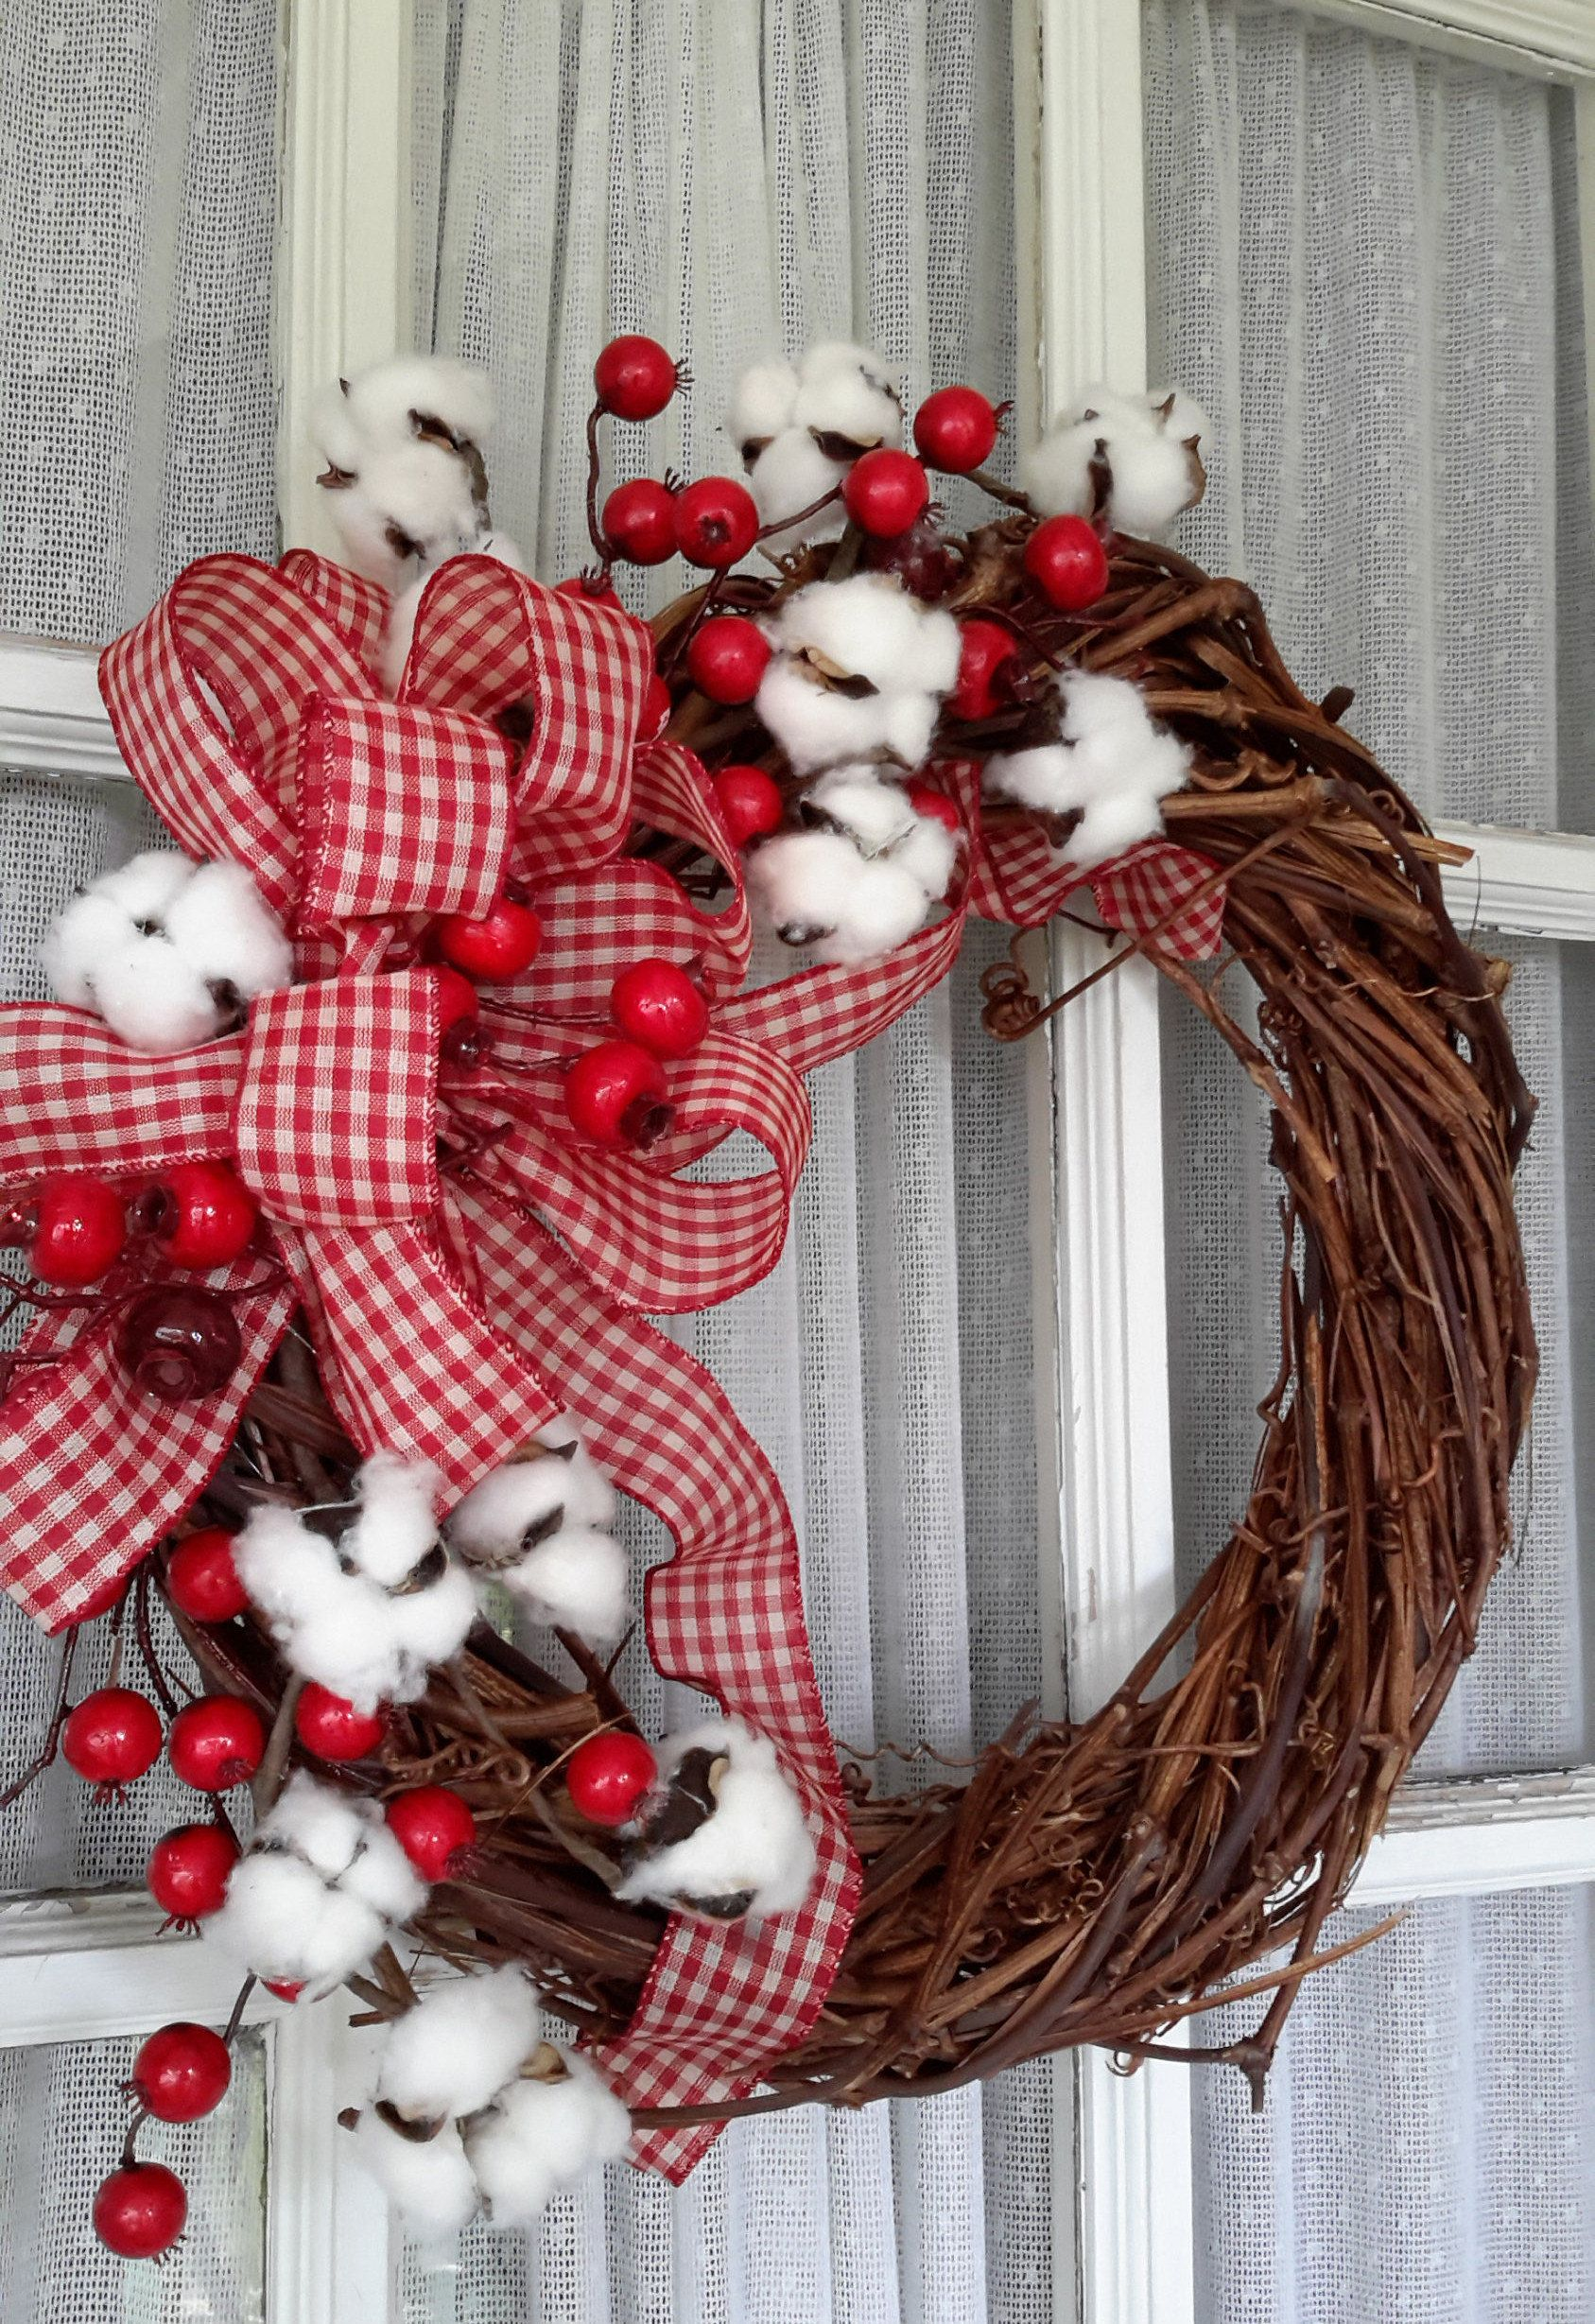 Country Christmas Cotton Wreath, Farmhouse Style Wreath